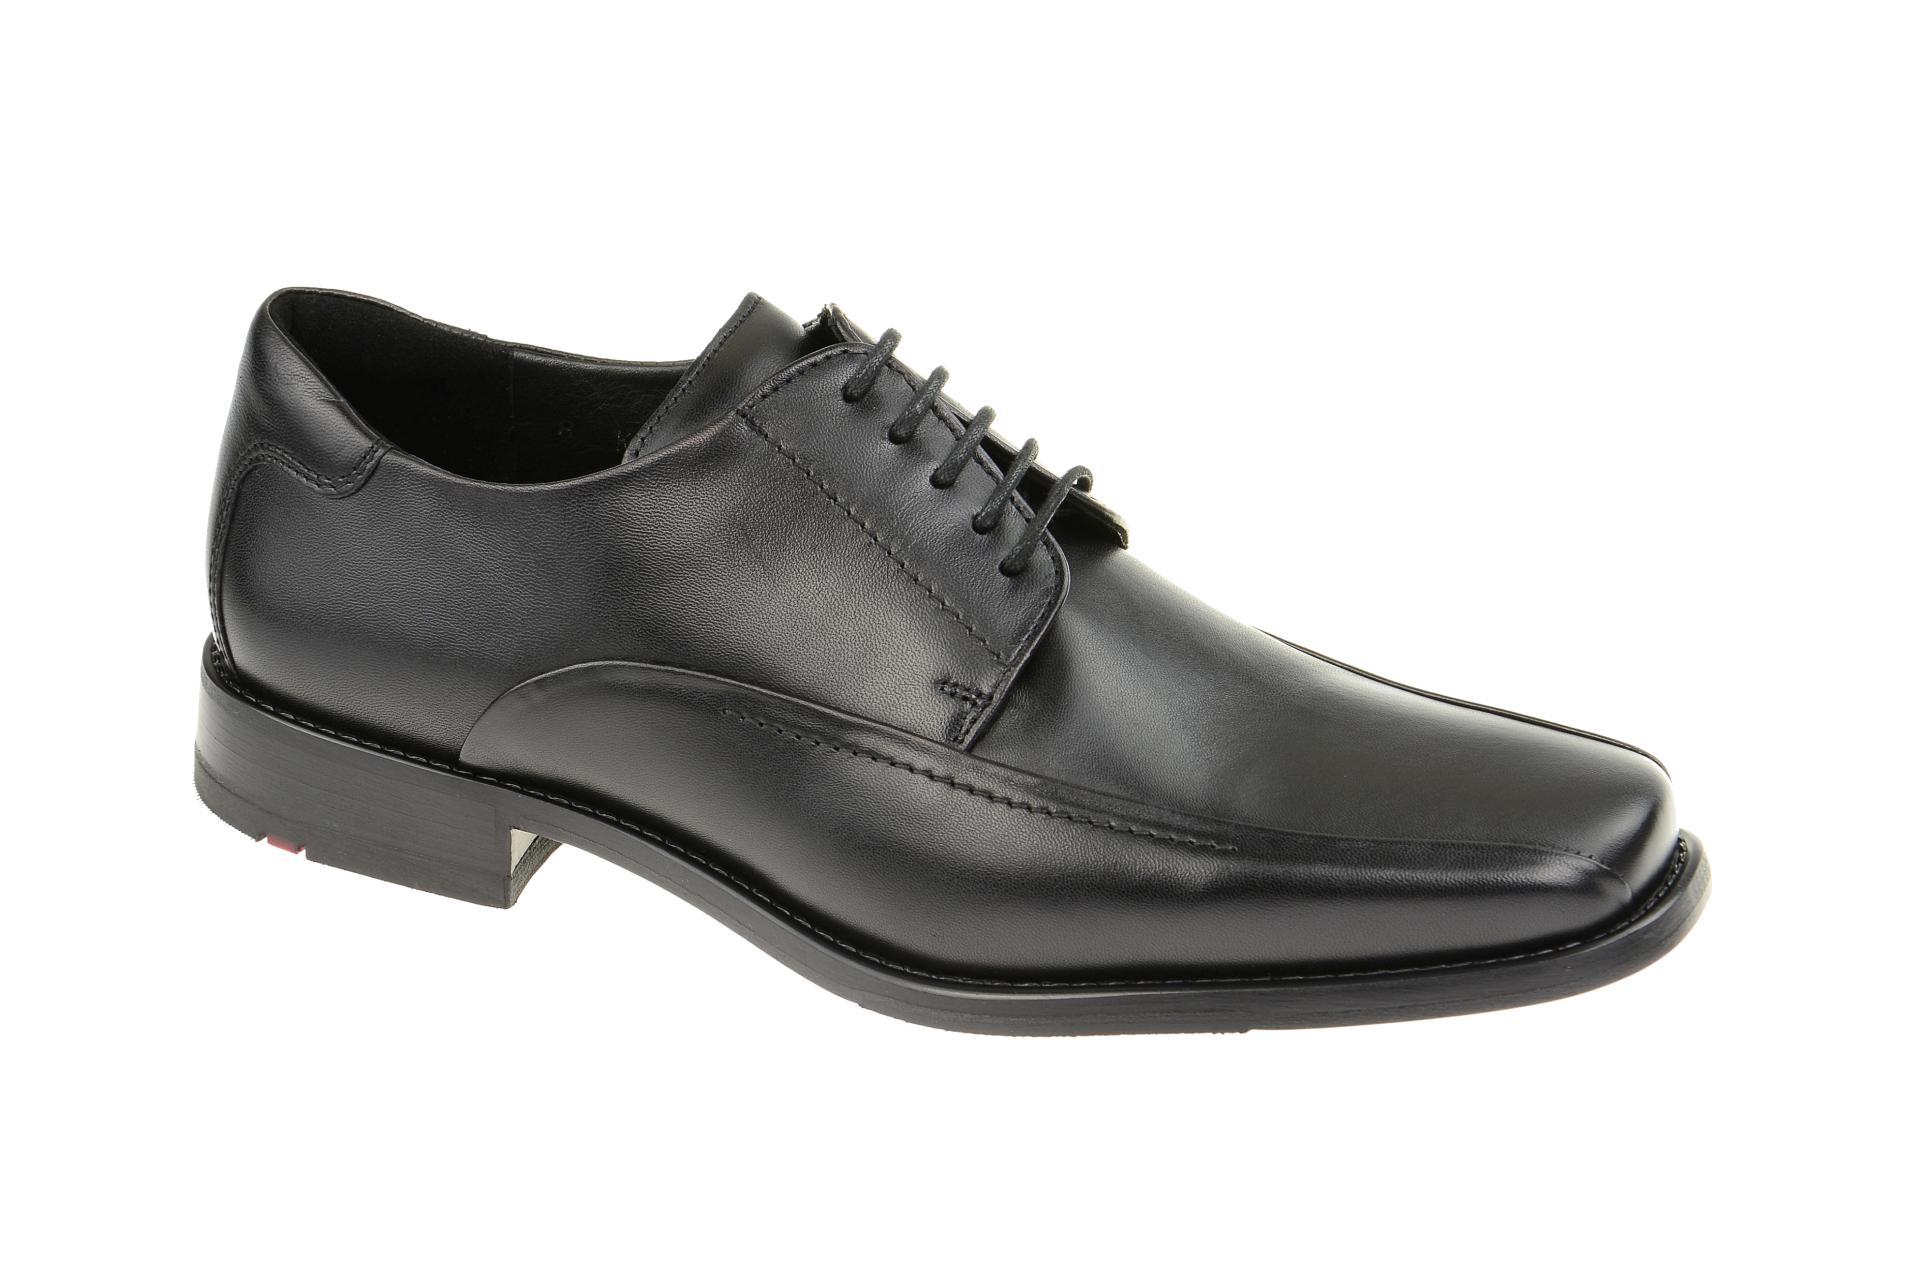 Lloyd Kelt Schuhe schwarz extra Weit - Businessschuhe Echtleder 17-363-00 Lloyd Billig Großhandelspreis vhiYIr